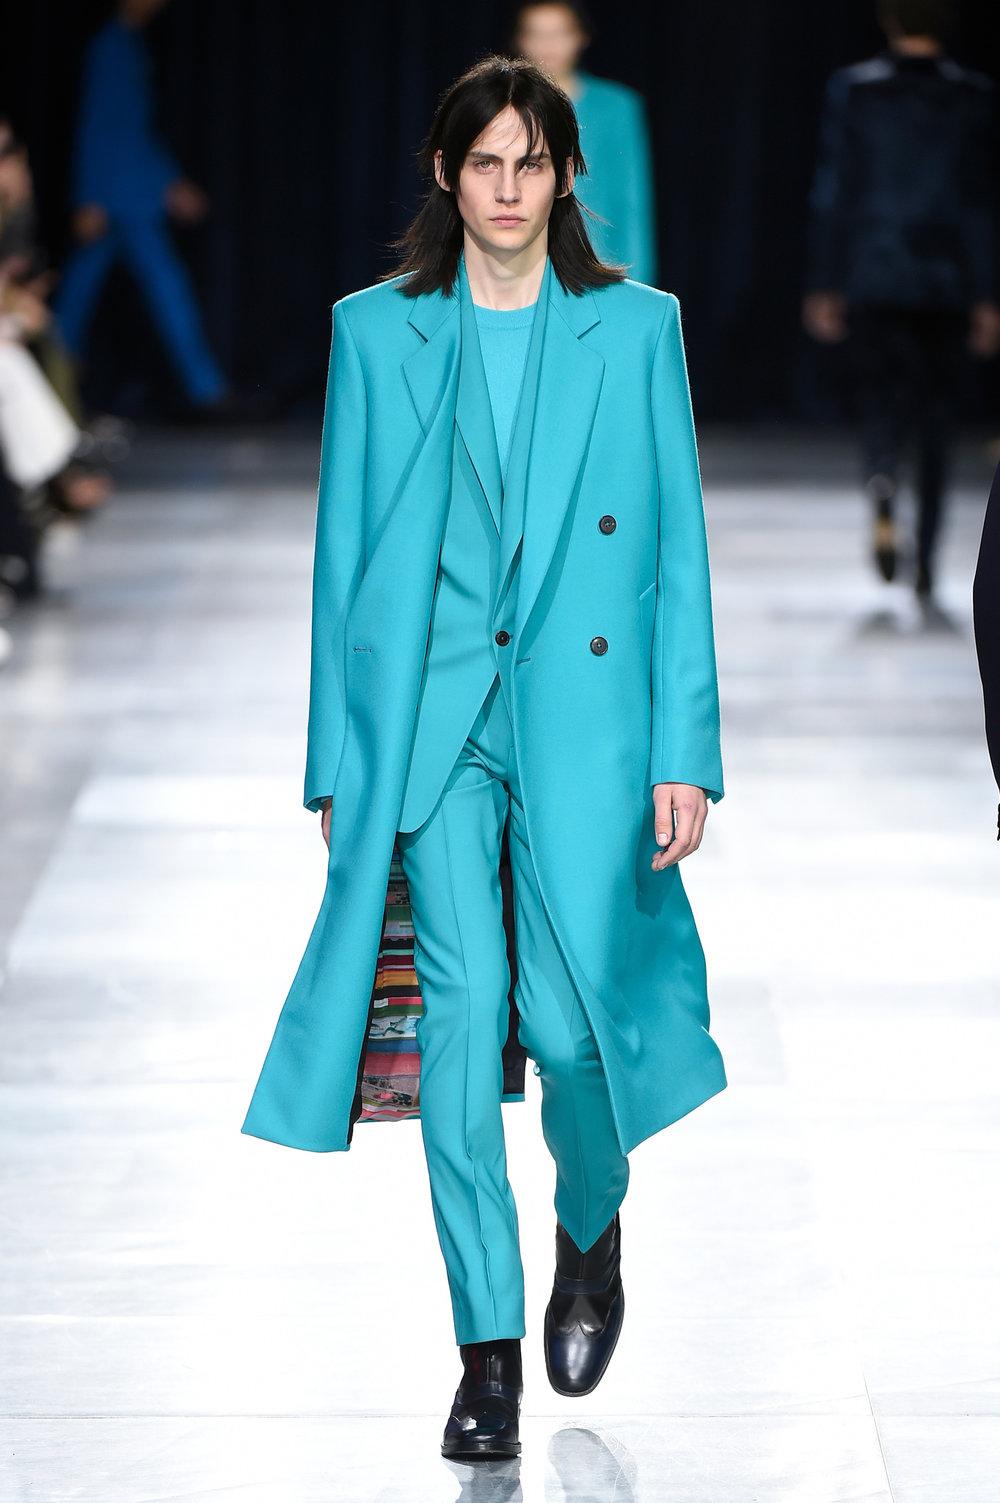 paul-smith-fall-men-2018-paris-fashion-week-pfw-036.jpg